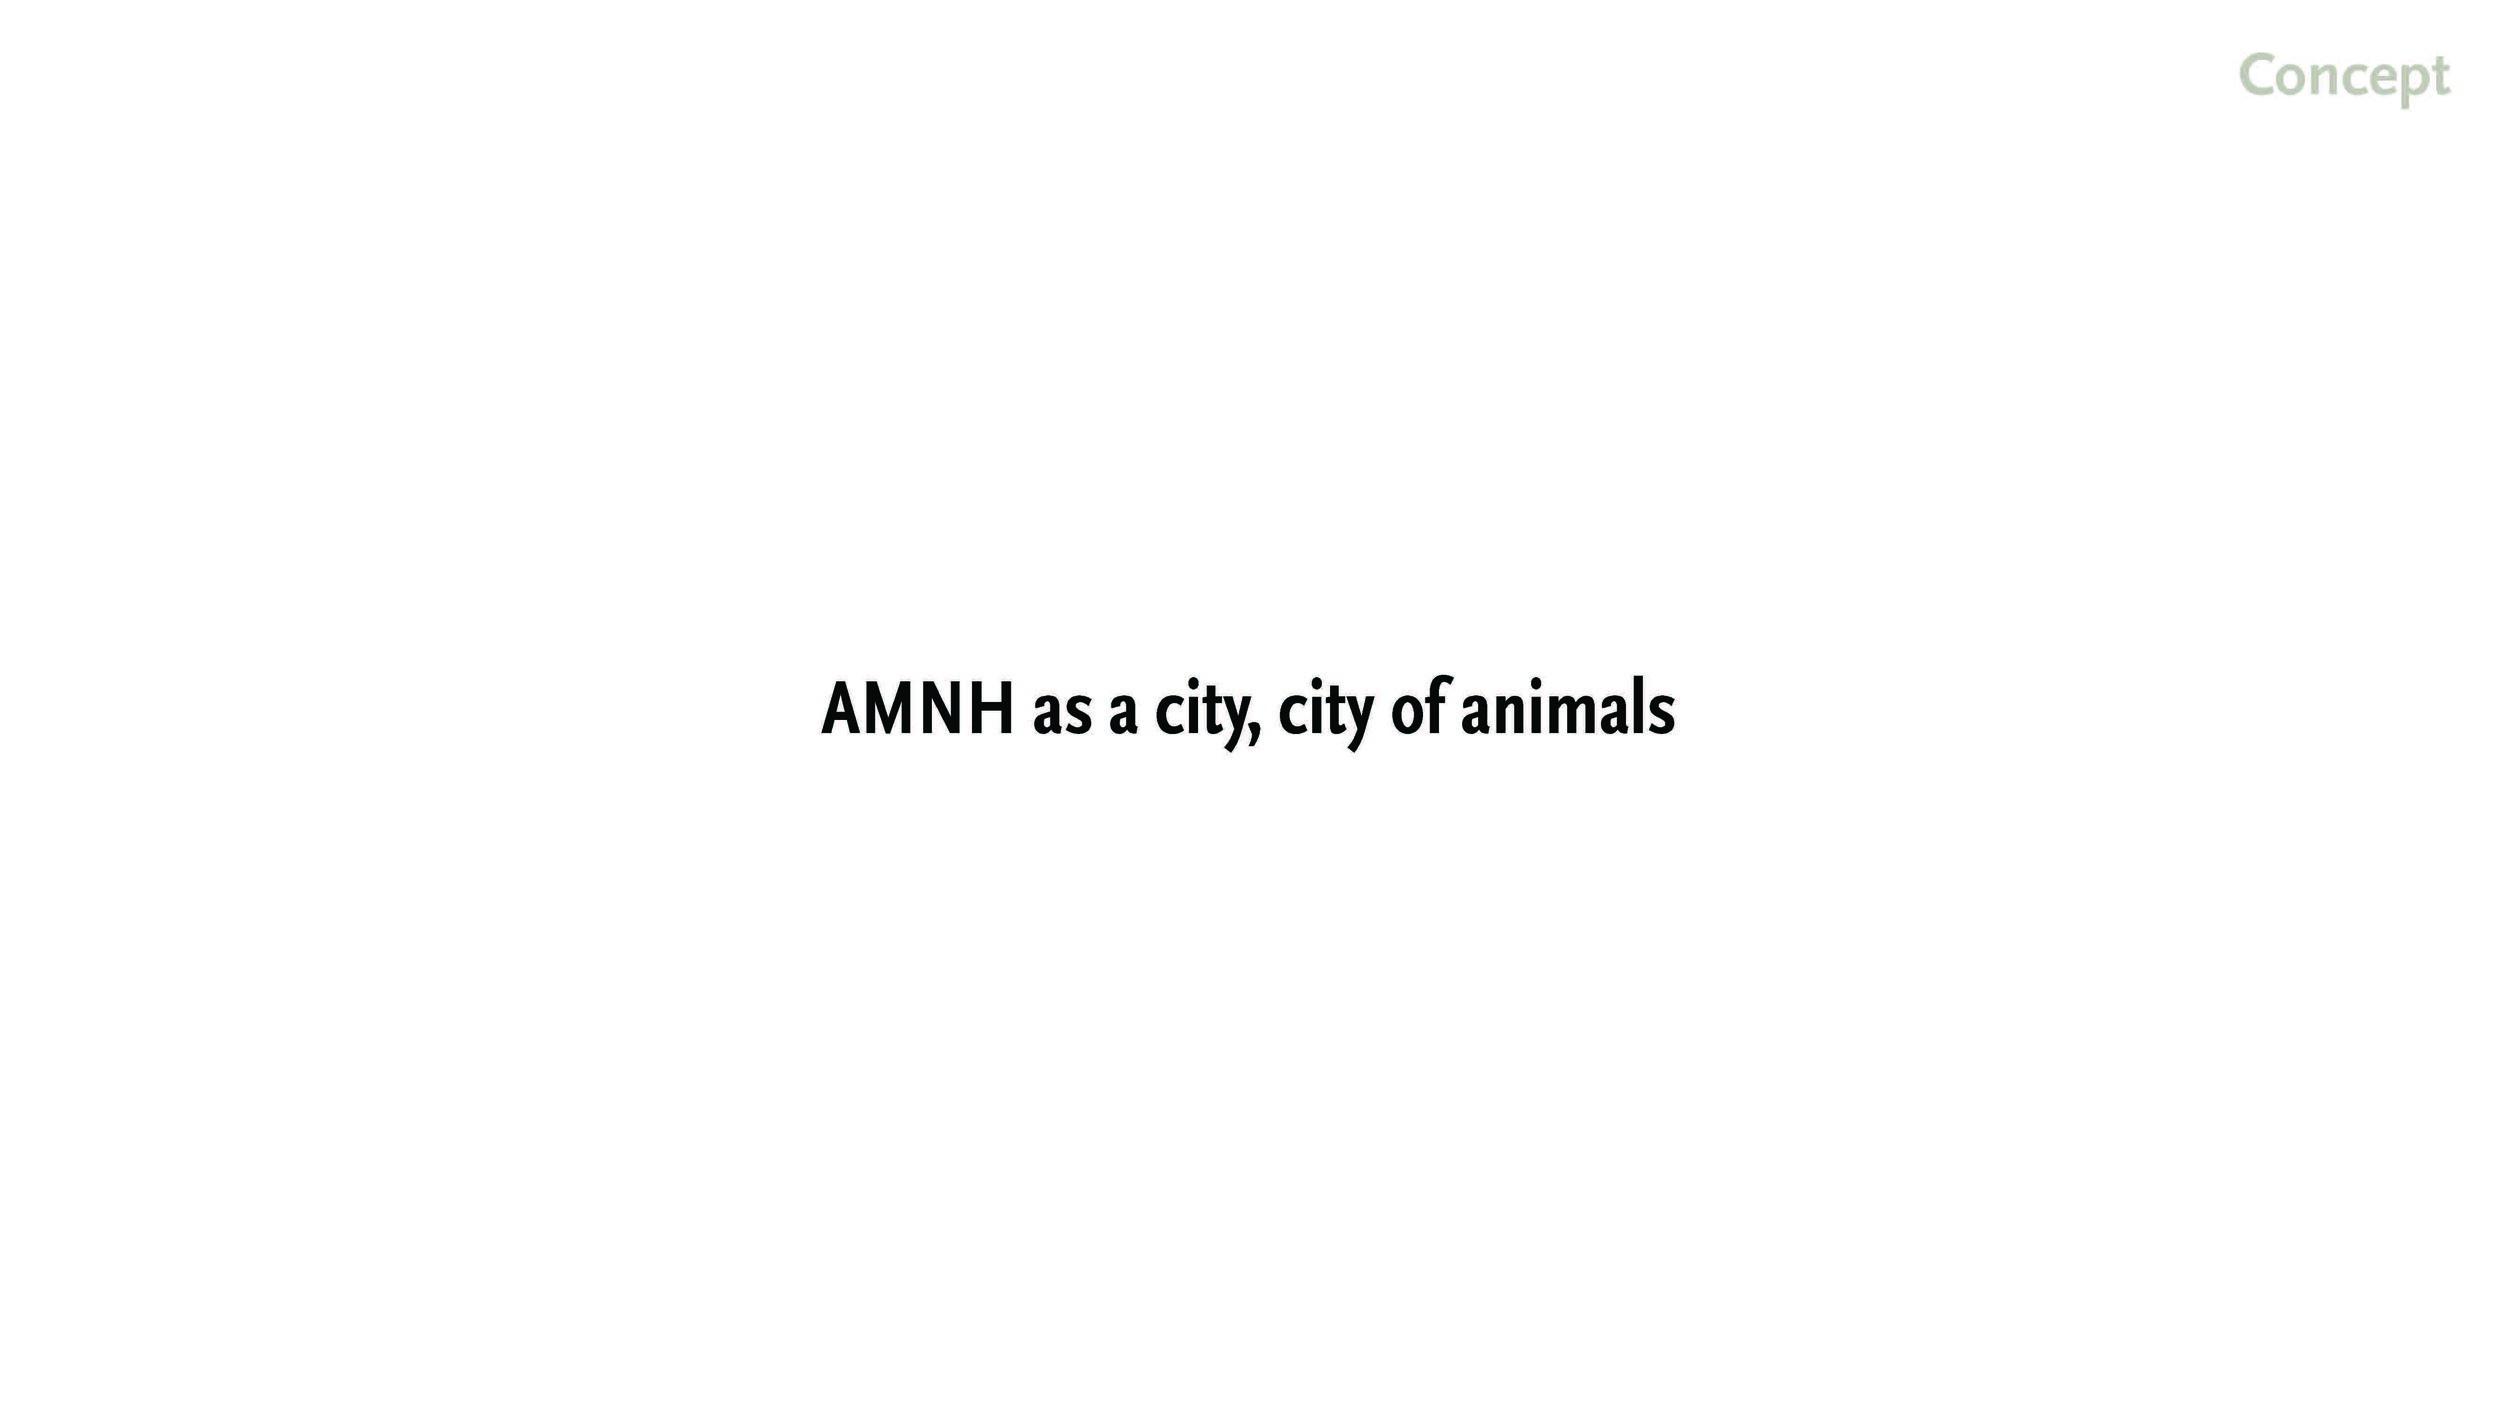 190519 AMNH Final Presentation_Page_08.jpg